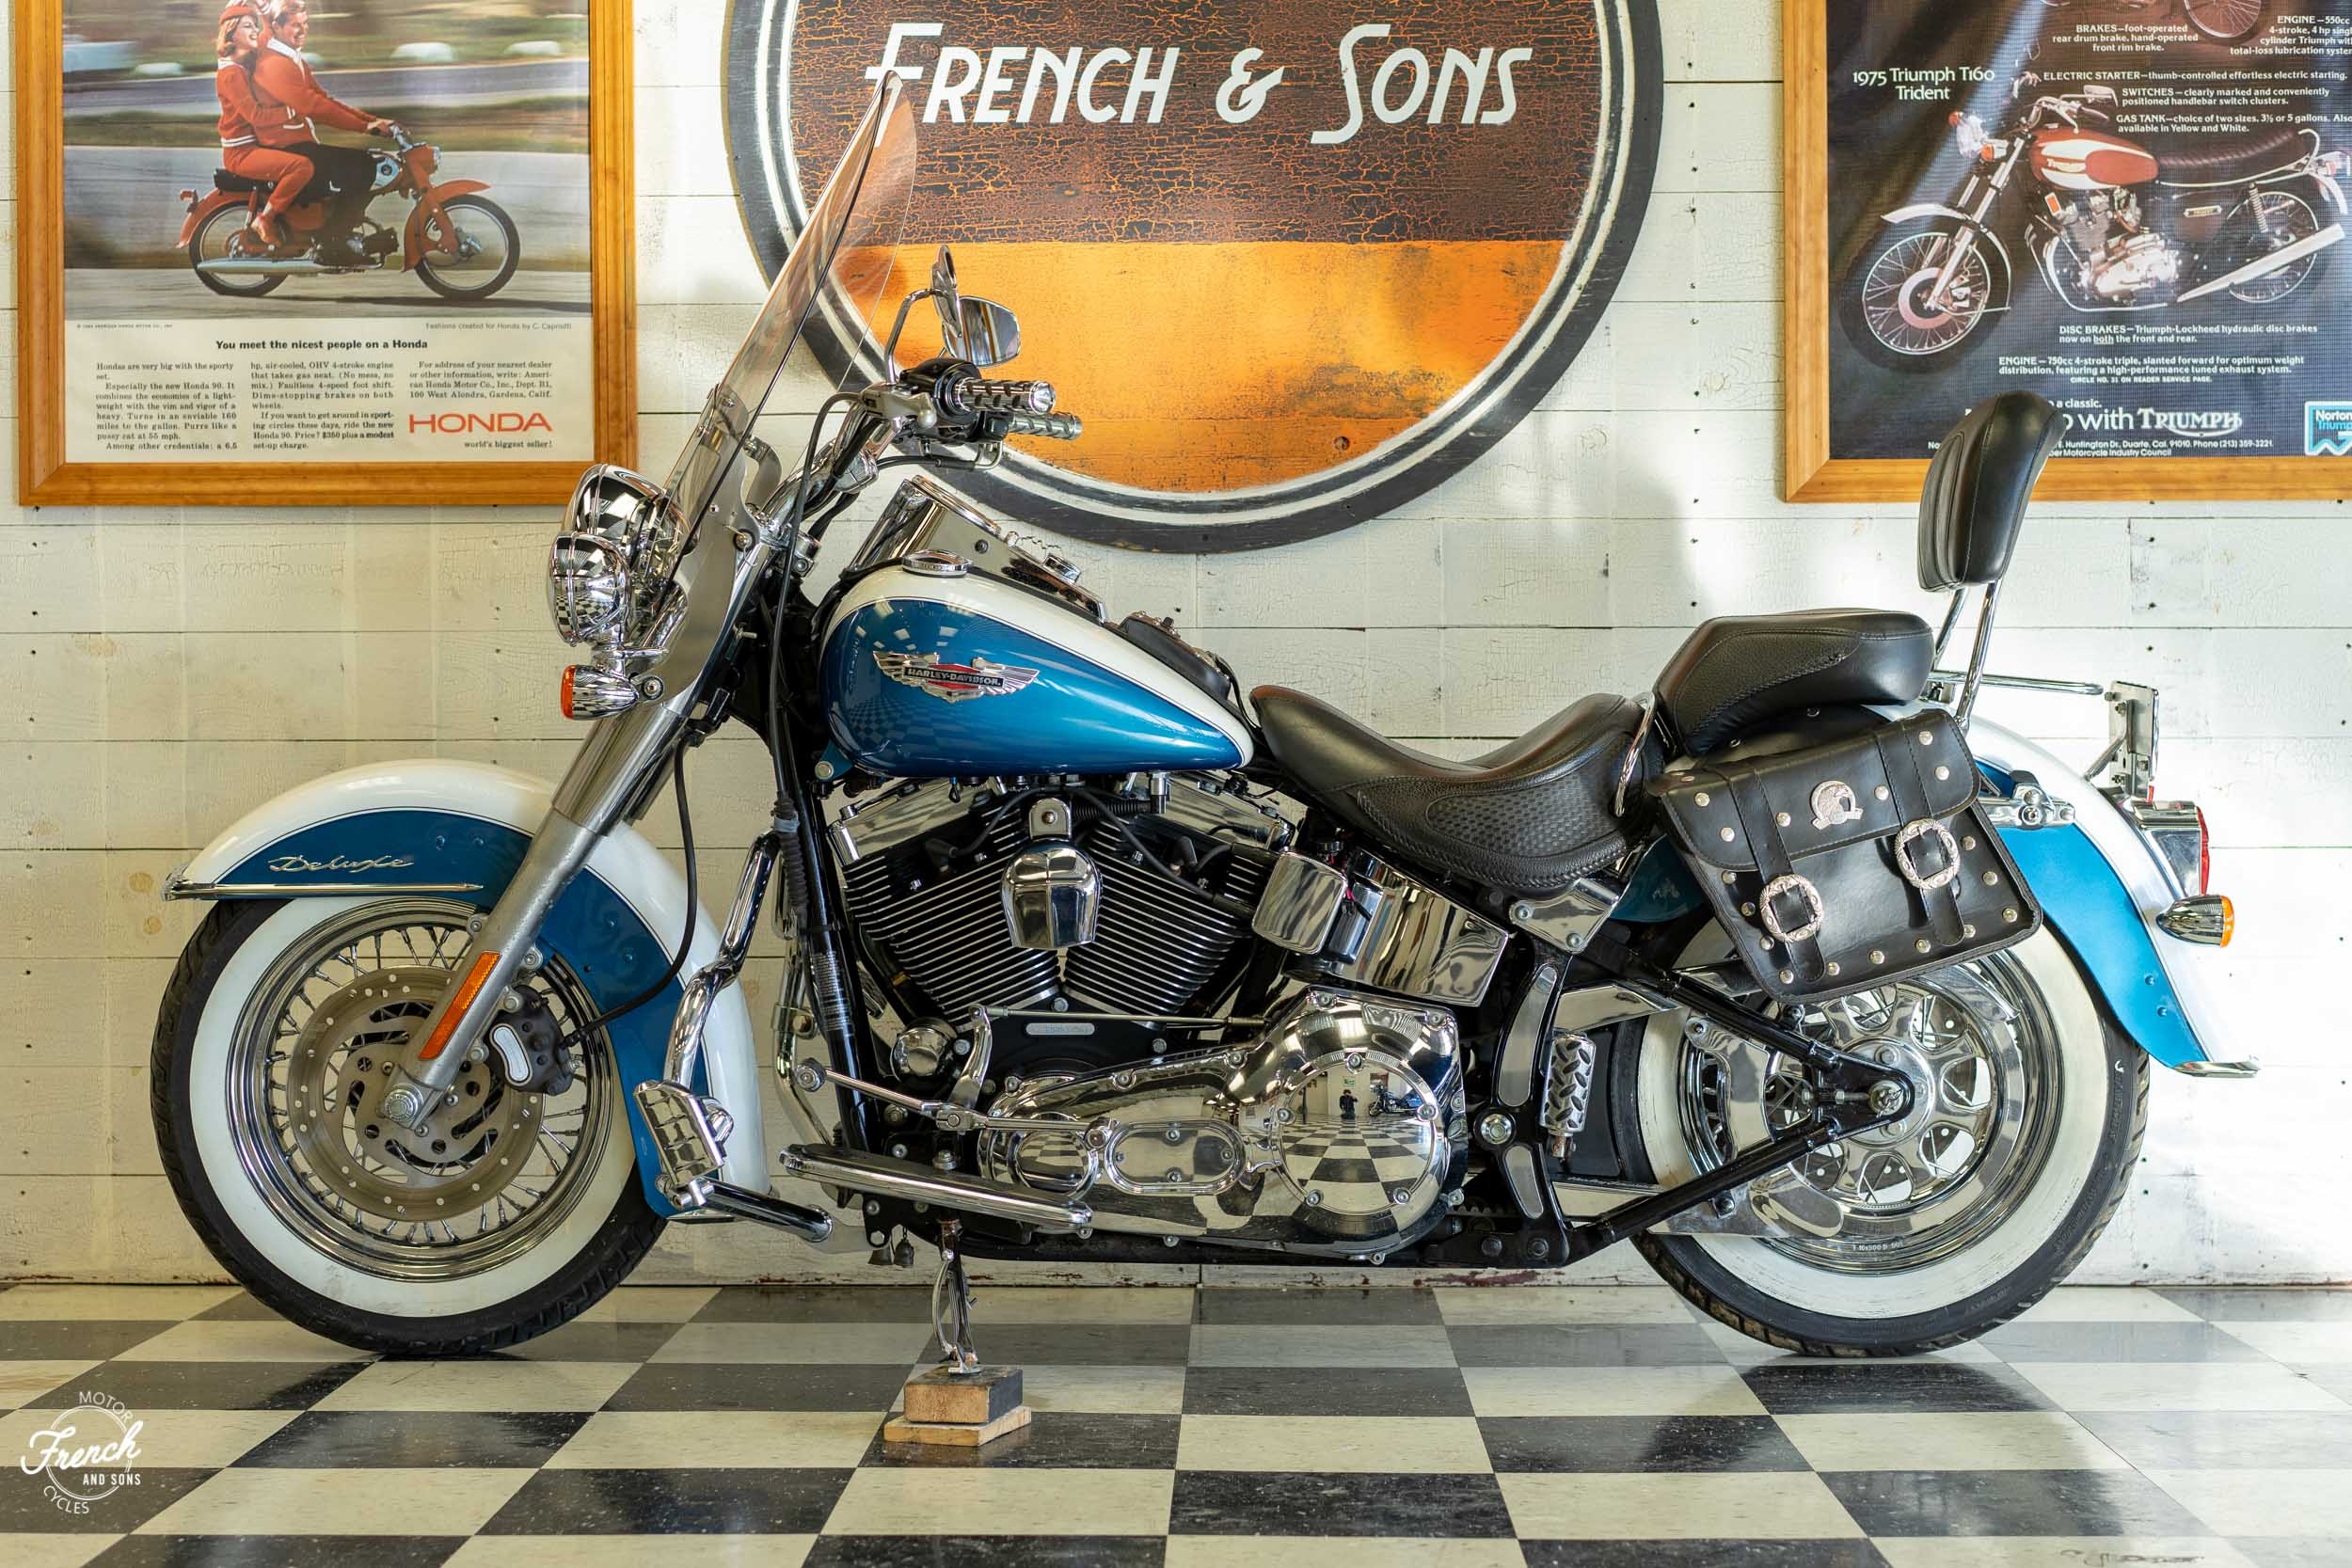 2005_Harley_Davidson_Softail_Deluxe-15.jpg